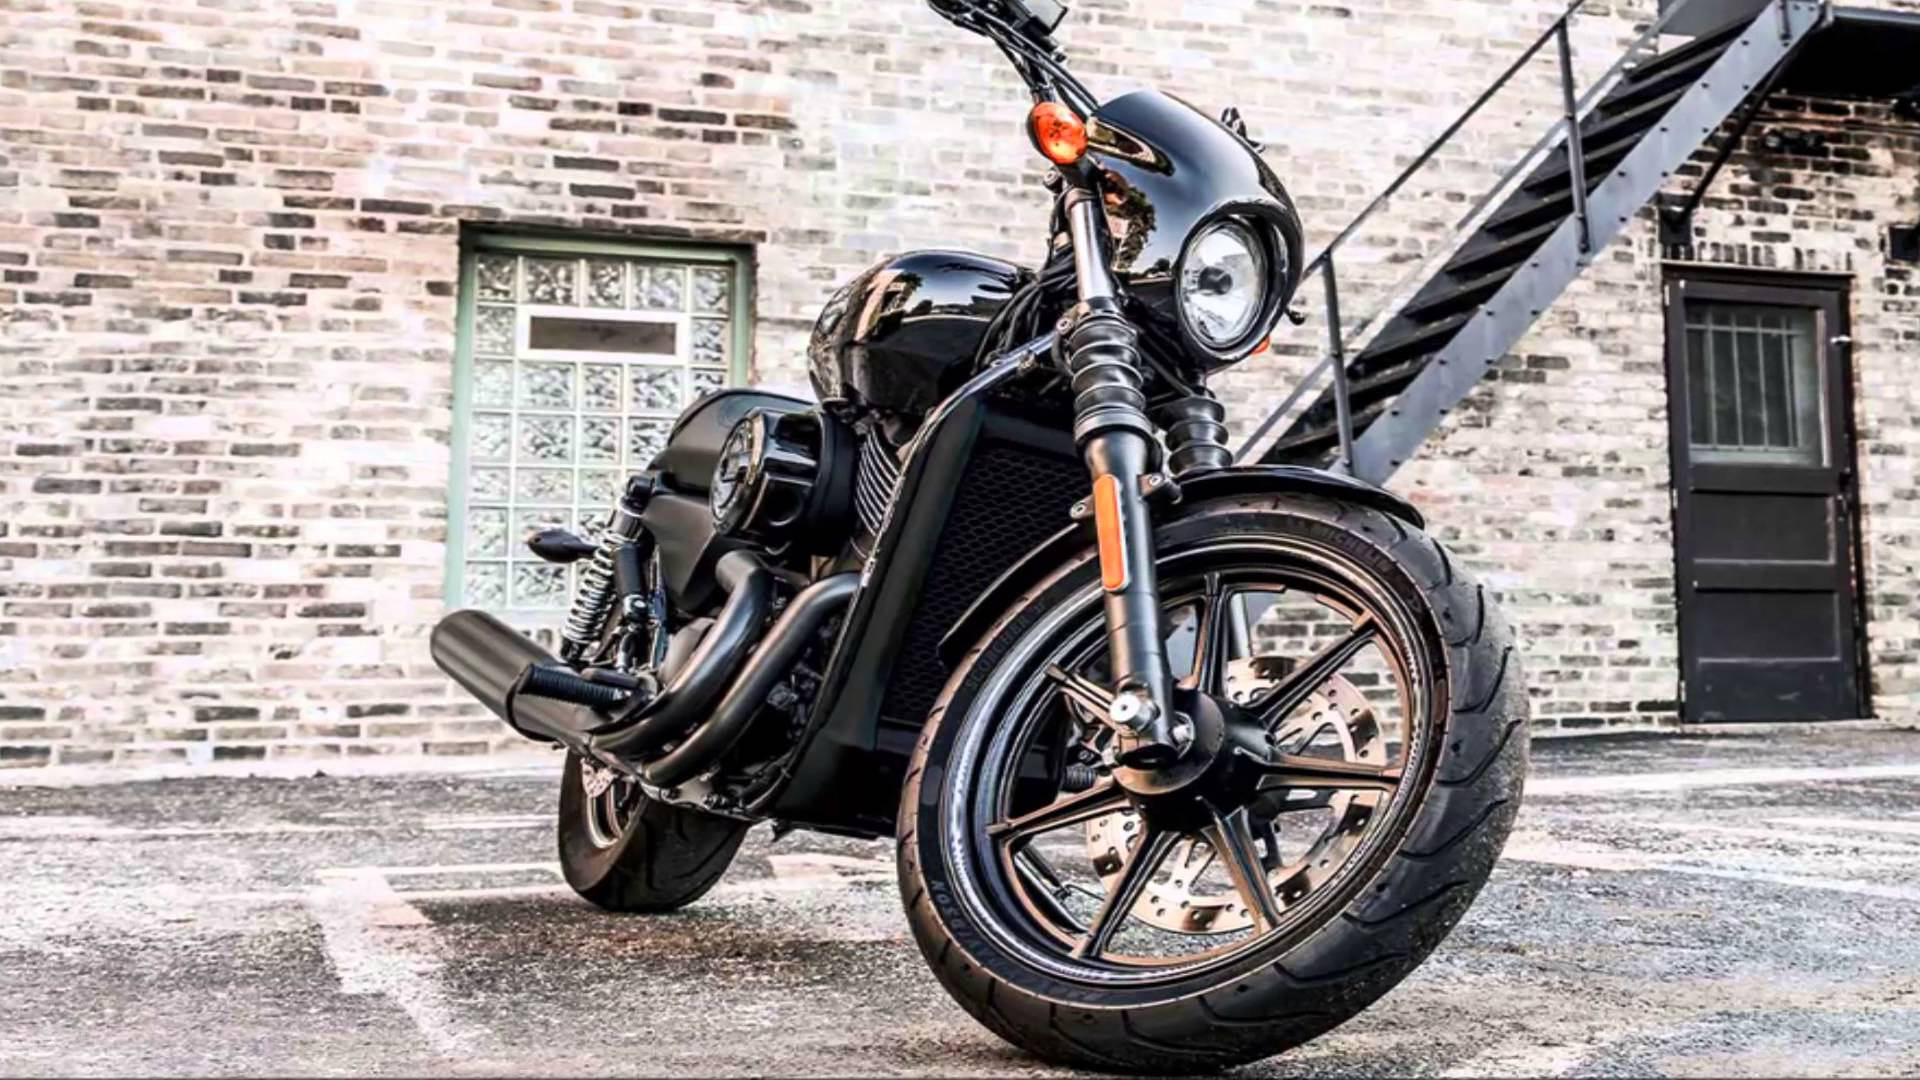 Harley Davidson Street 500 Wallpapers